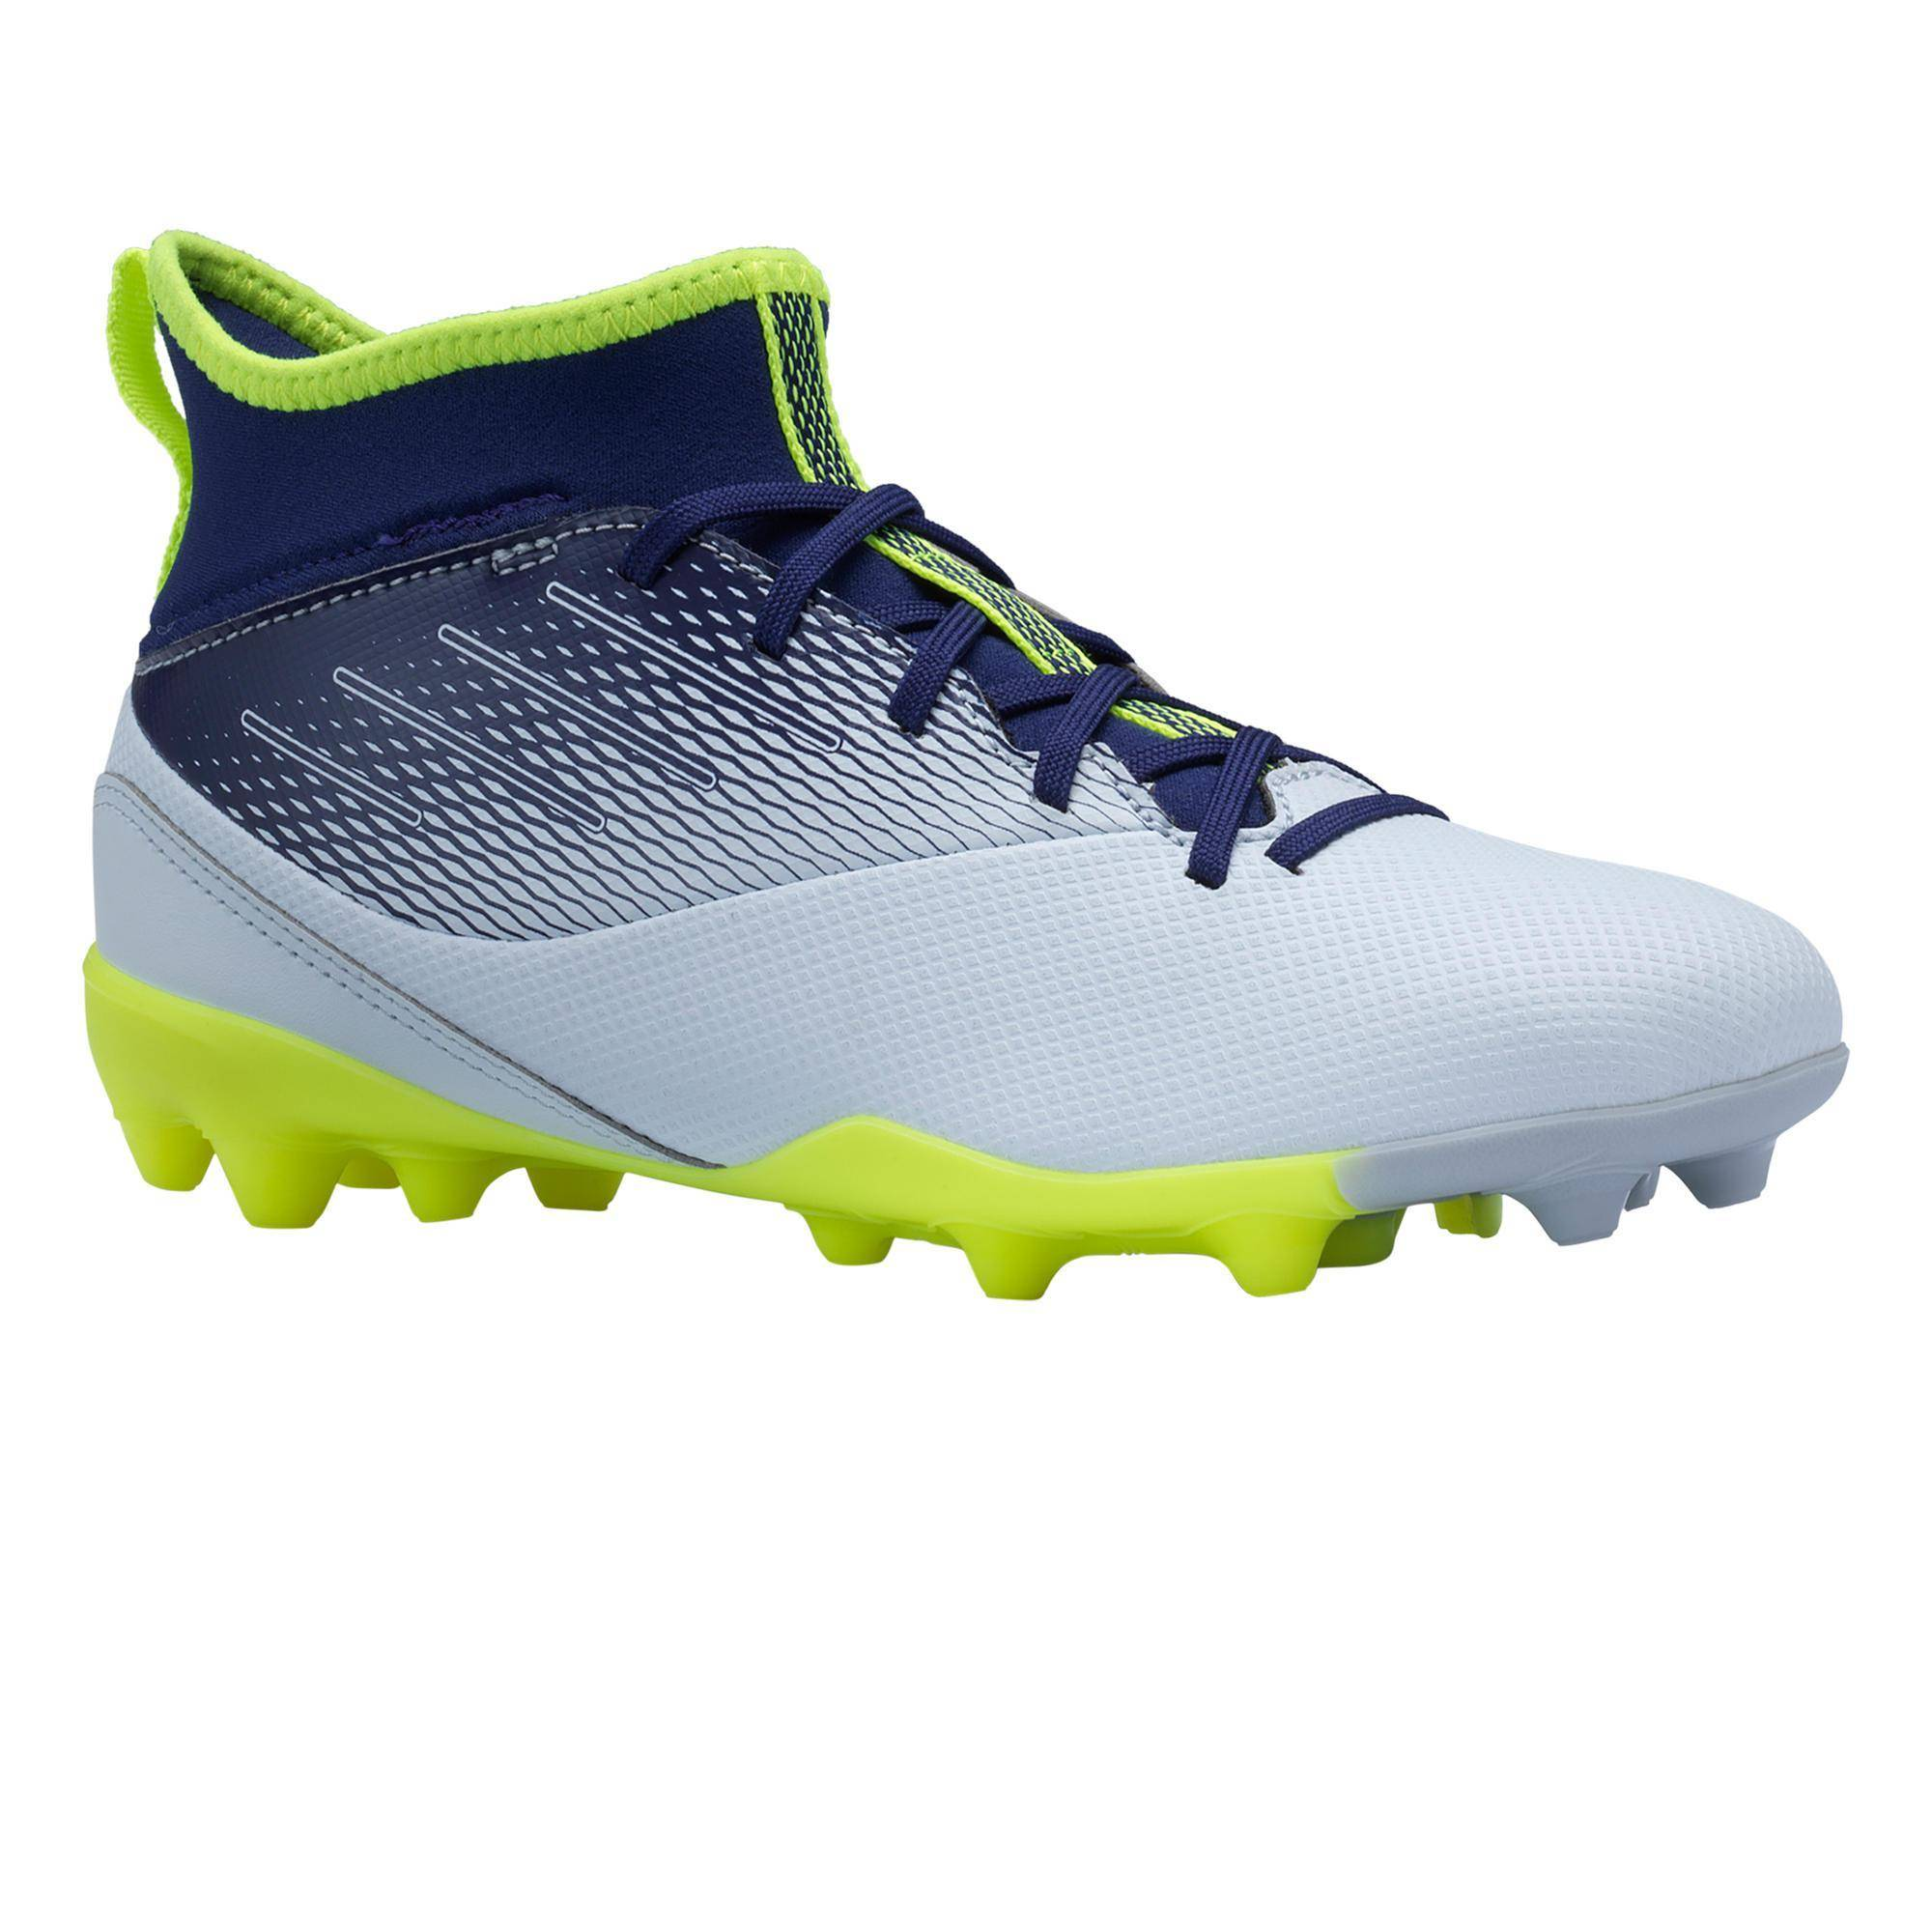 KIPSTA Scarpe calcio bambino AGILITY 500 MG grigio-blu